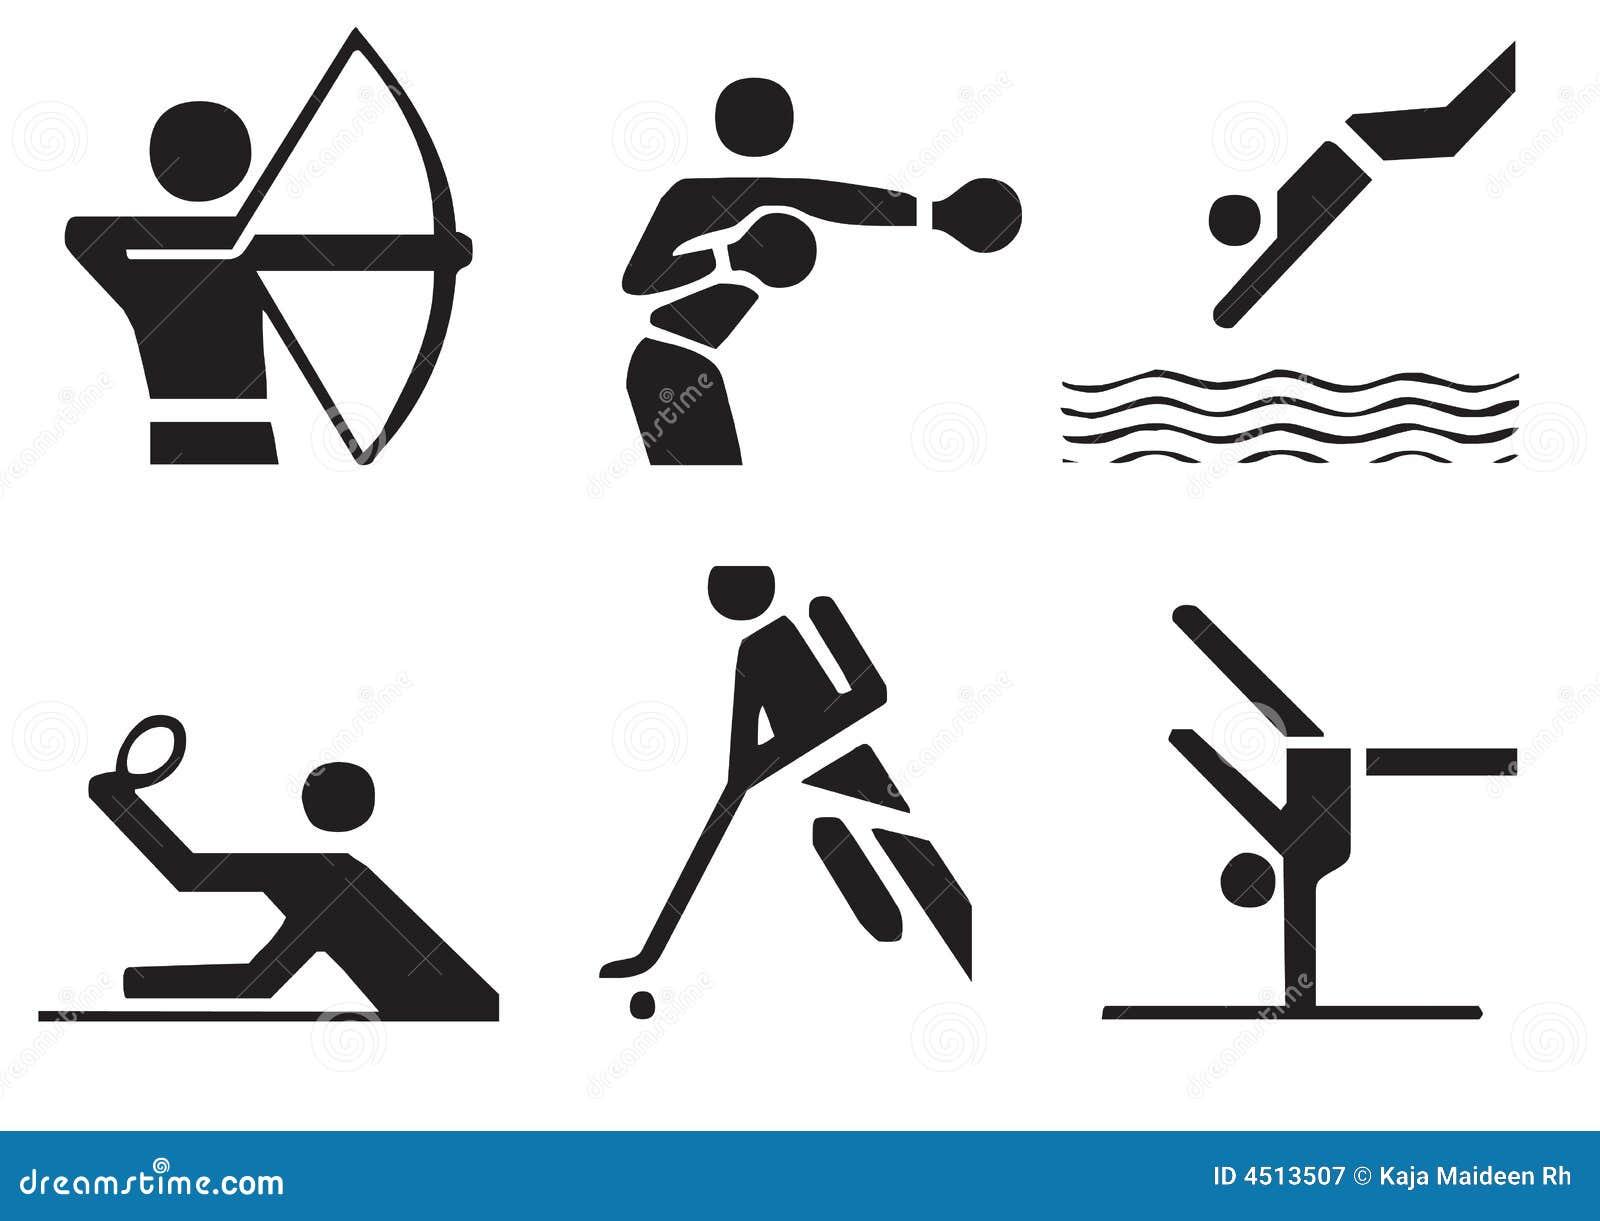 Vector sports symbols 3 stock illustration illustration of jump vector sports symbols 3 biocorpaavc